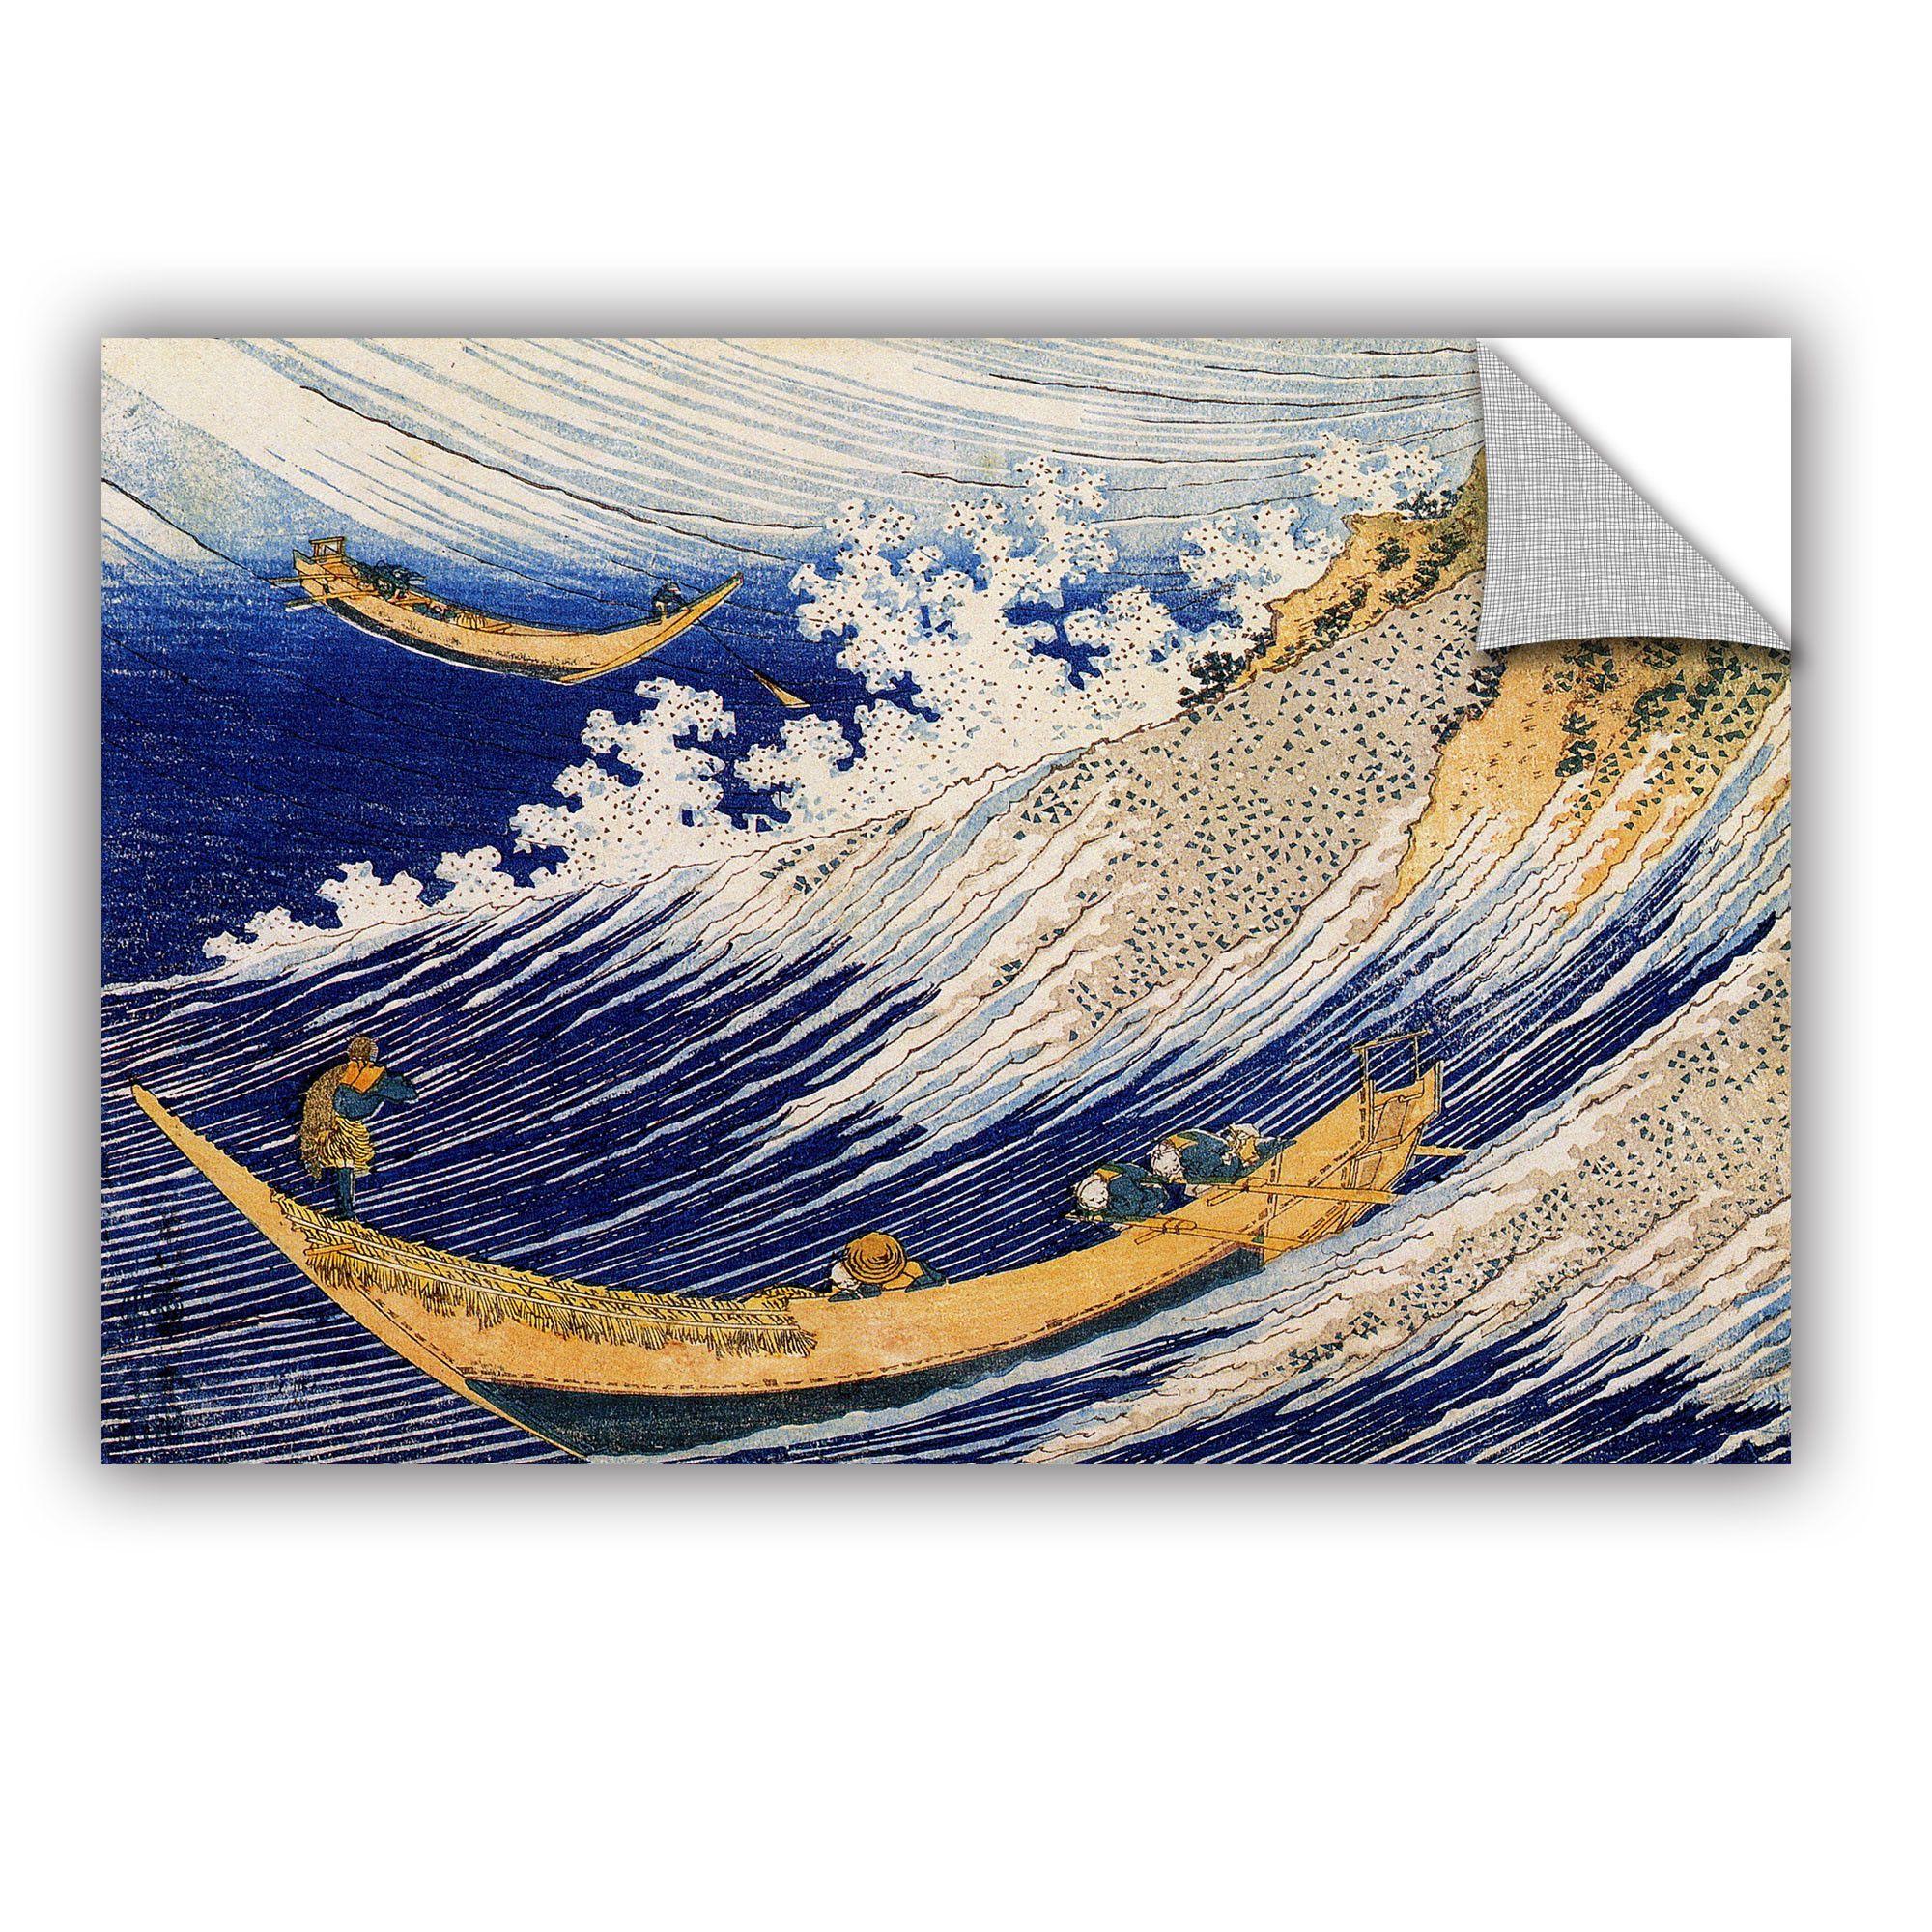 ArtApeelz Ocean Waves by Katsushika Hokusai Painting Print on Canvas